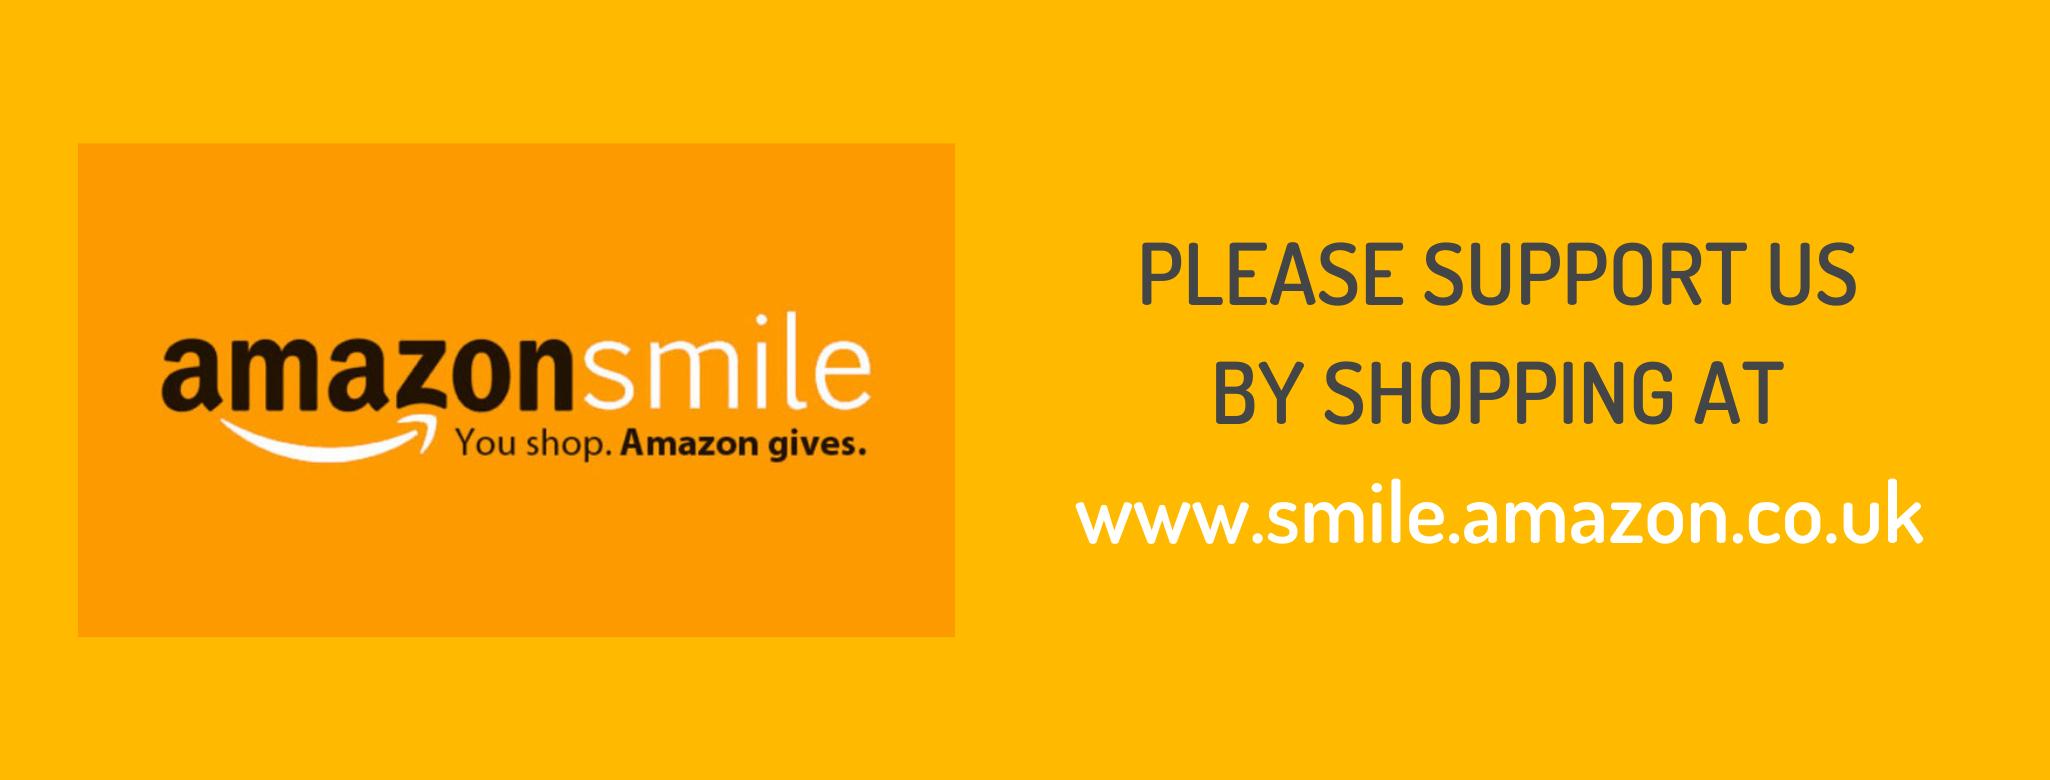 Amazon Smile banner image